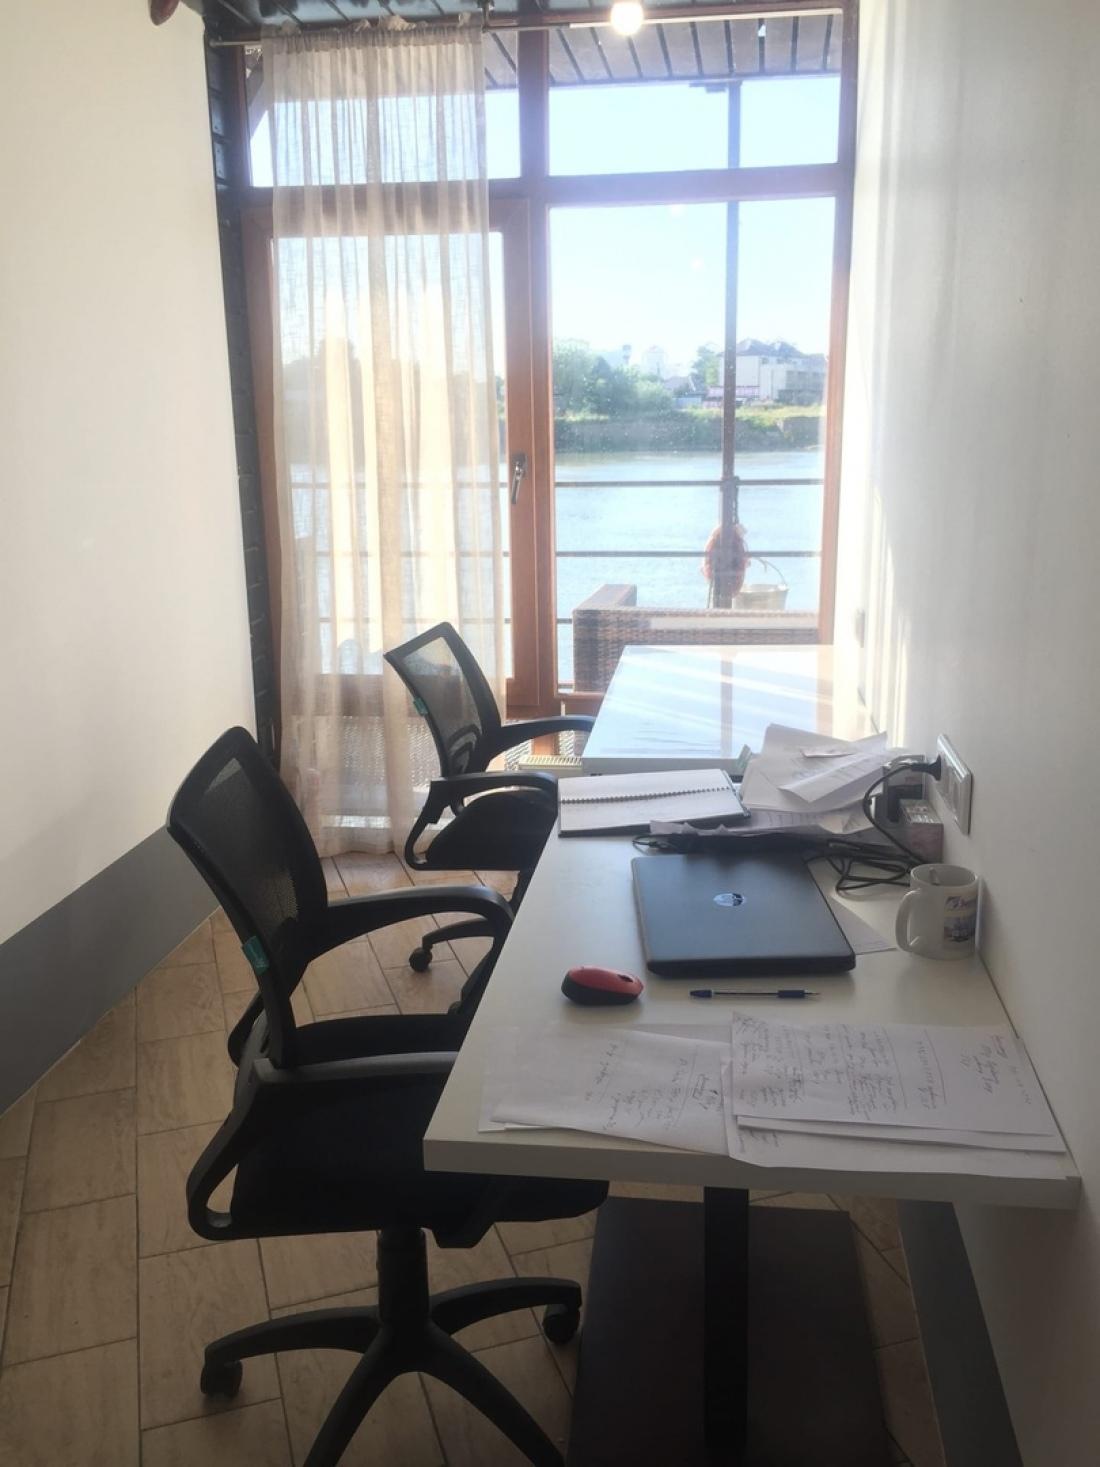 Офис на 2 рабочих места